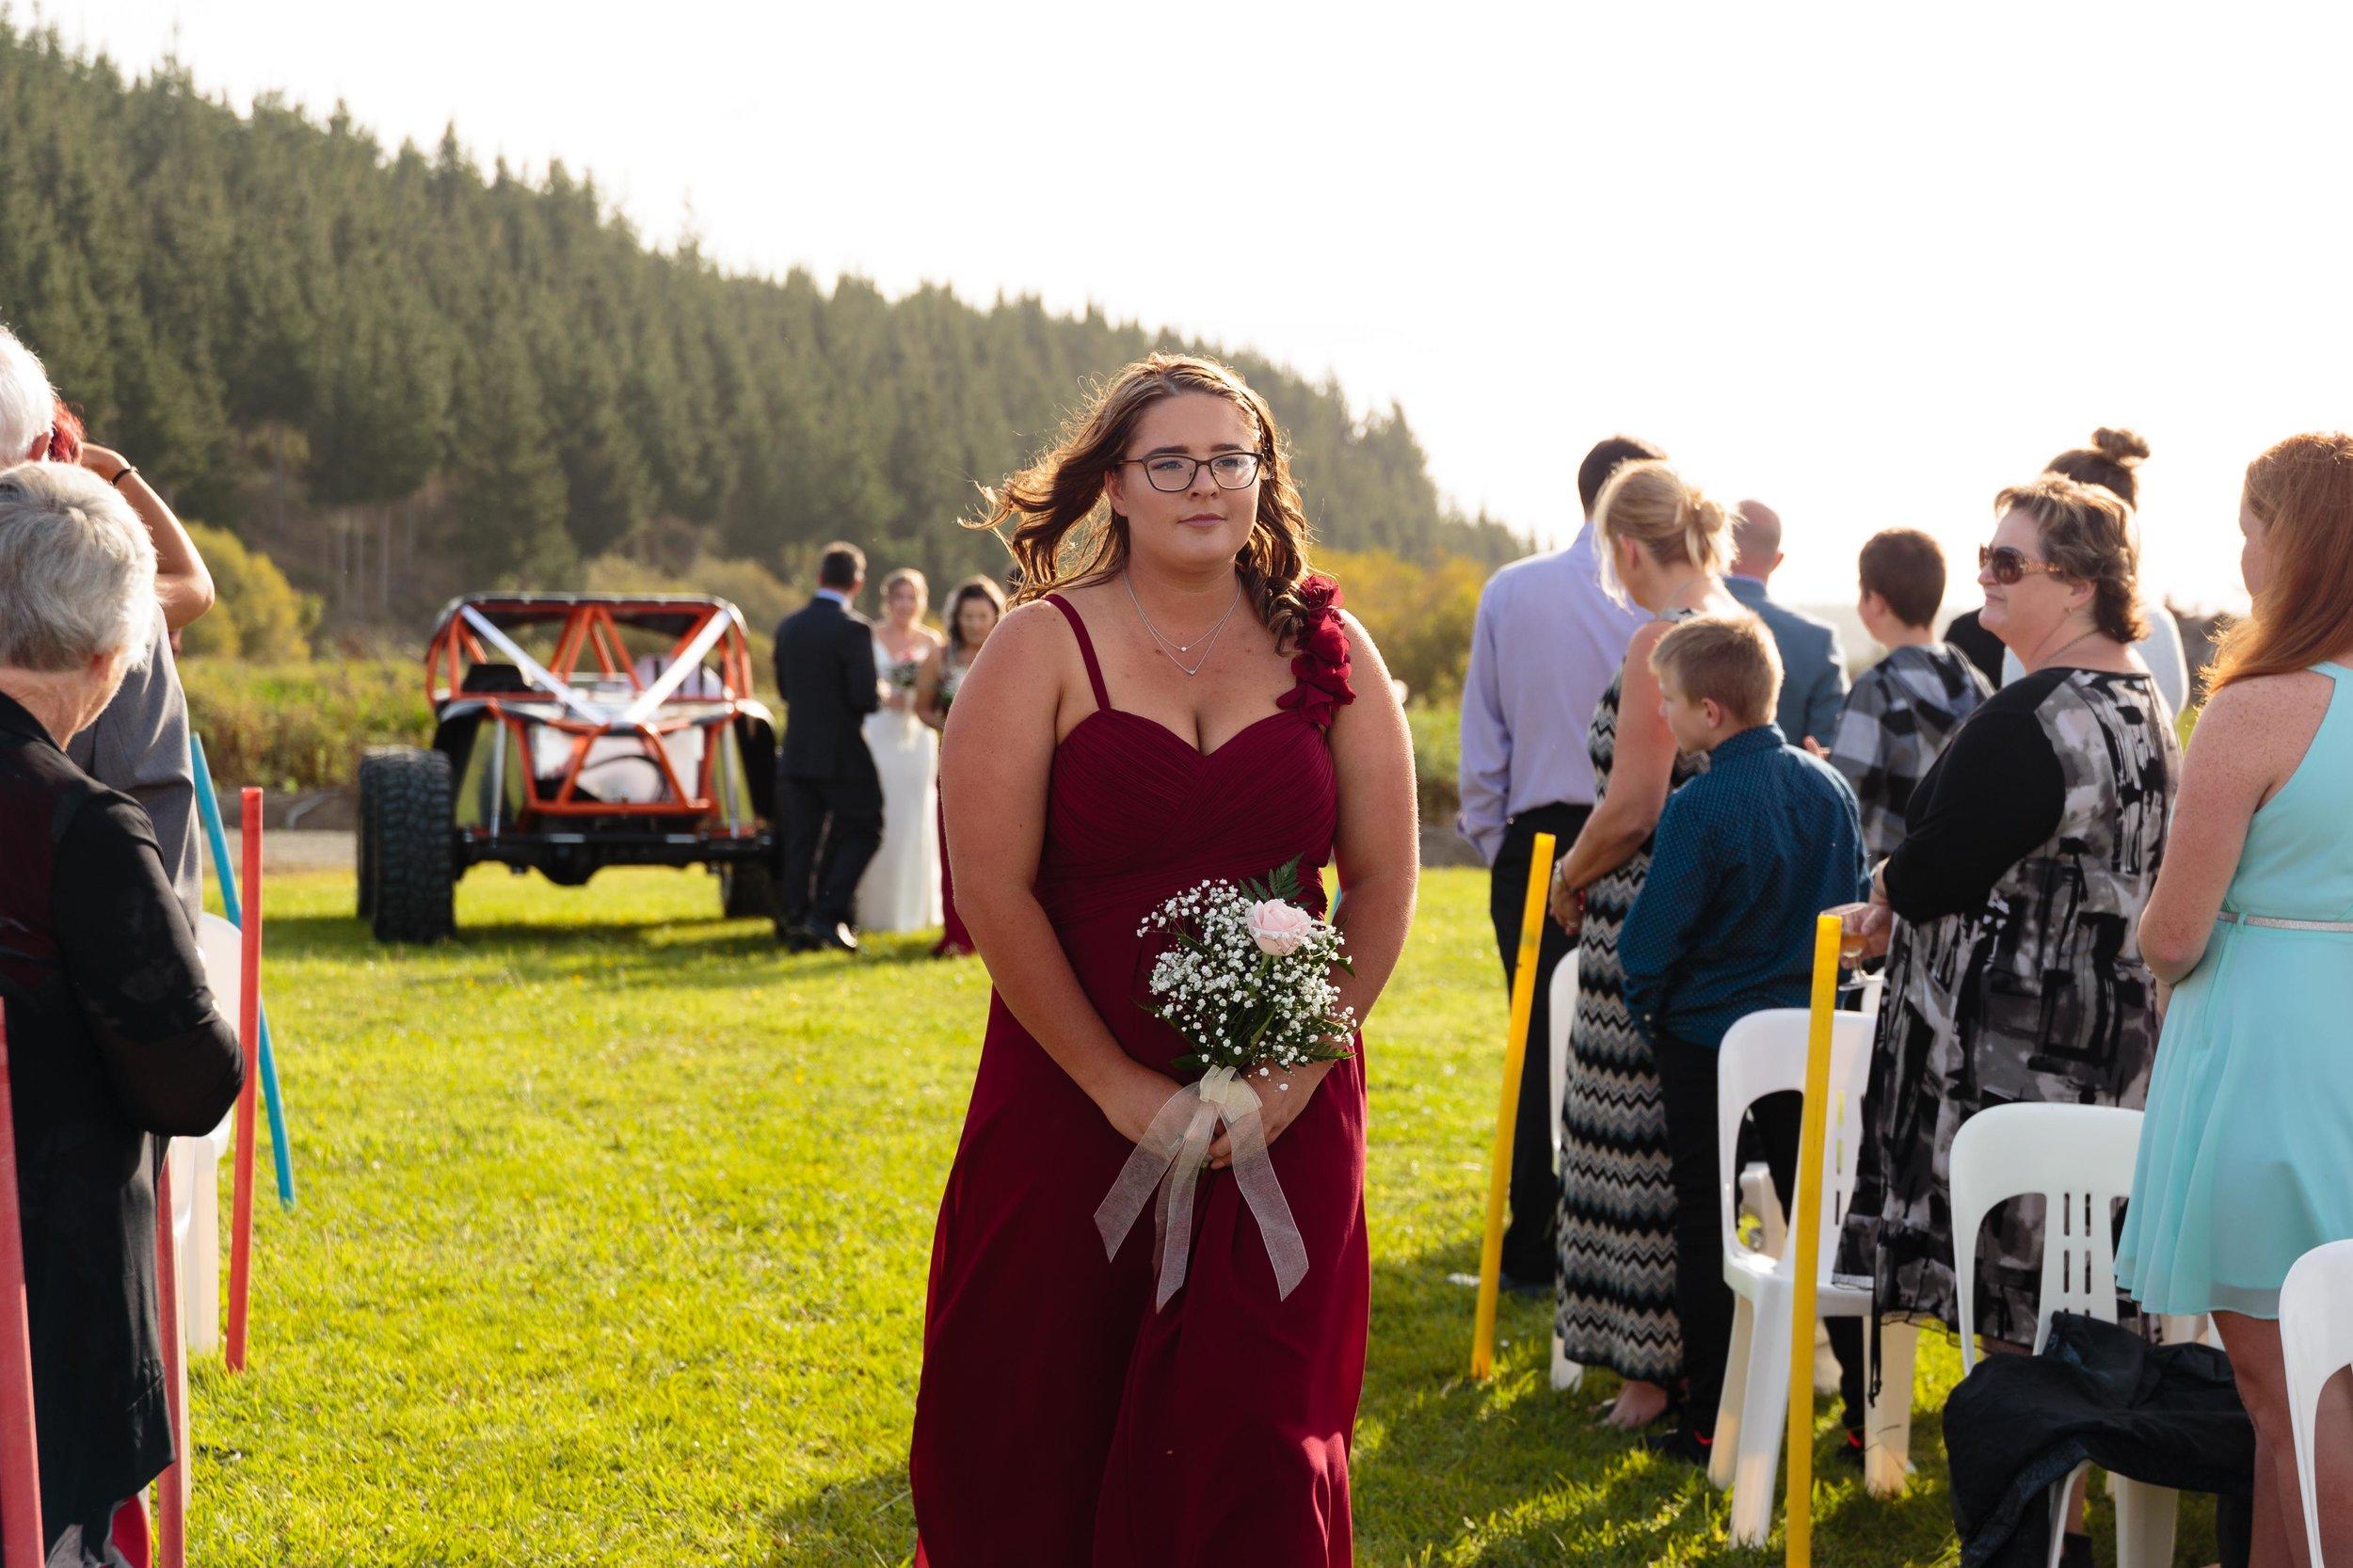 Highight-wedding-photography-dudding-lake-palmerston-north-new-zealand-29.jpg